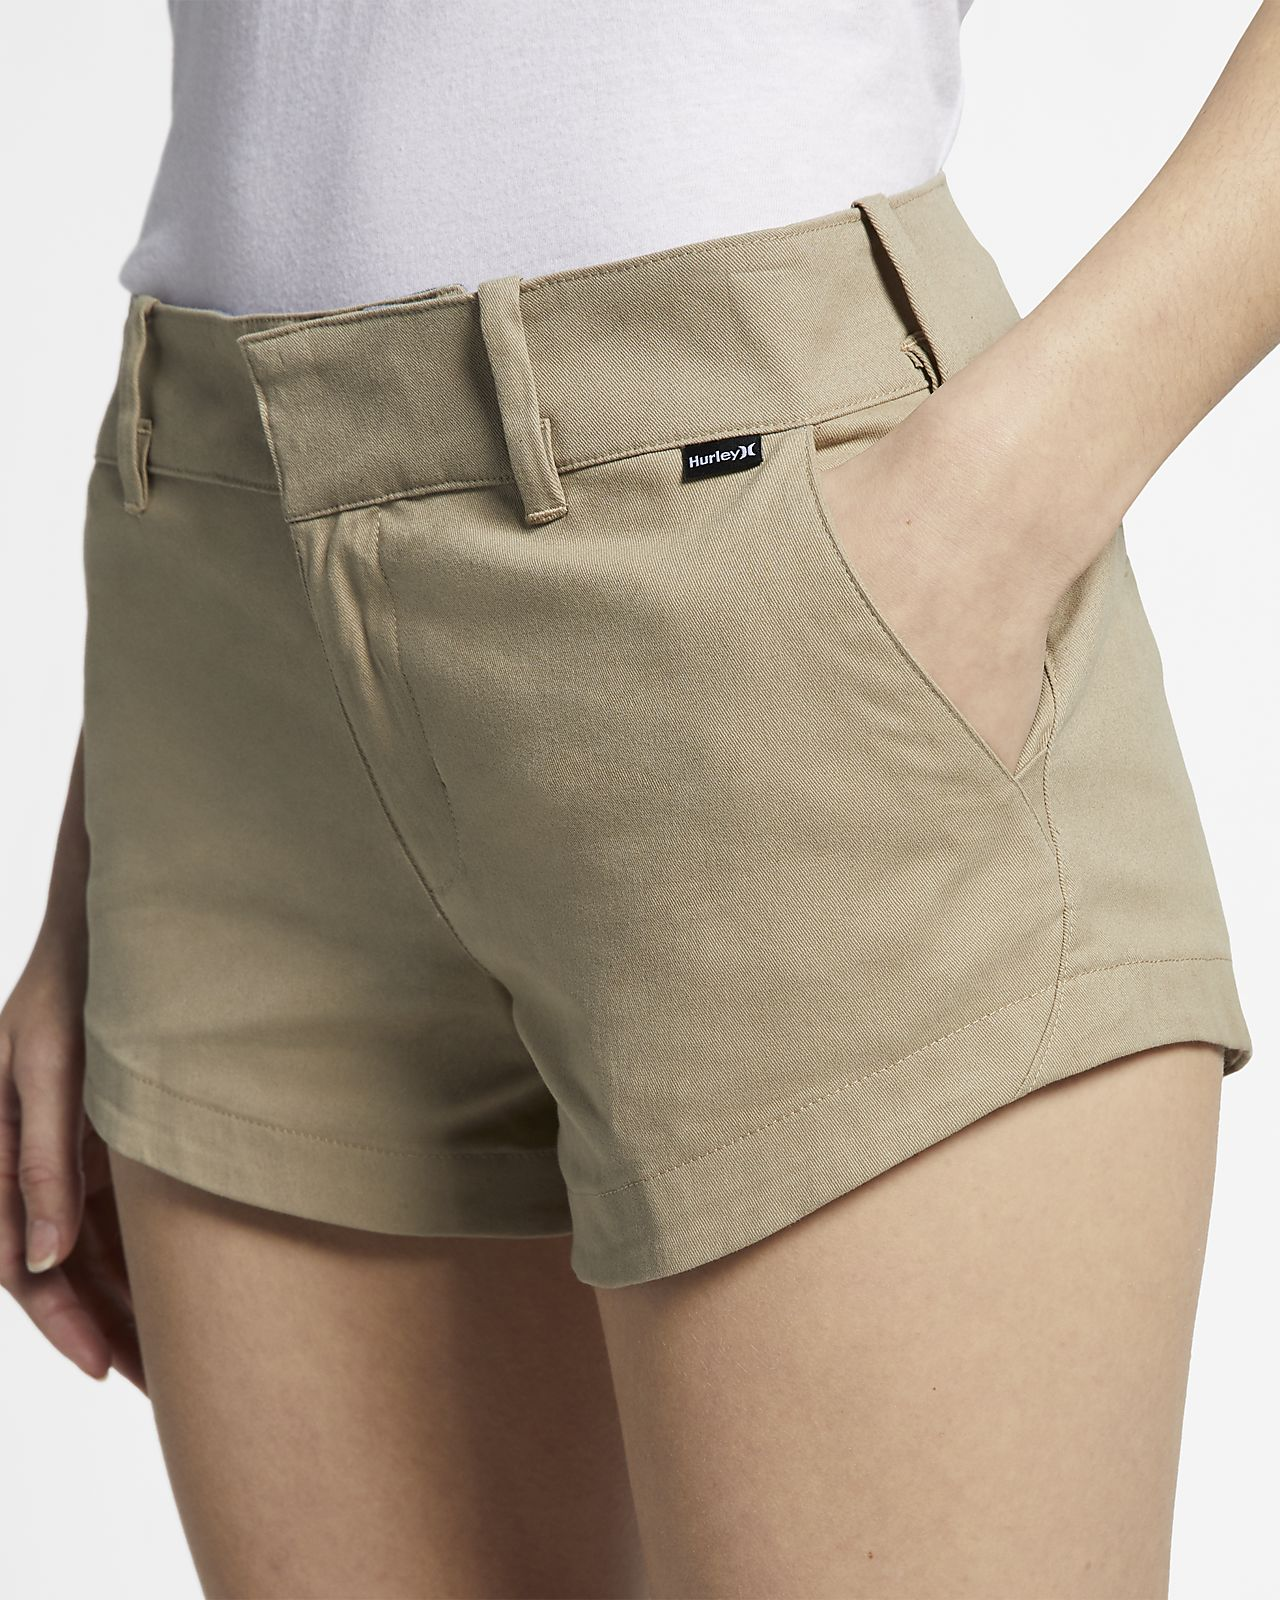 e77262746 Shorts para mujer Chino Hurley Lowrider. Nike.com MX